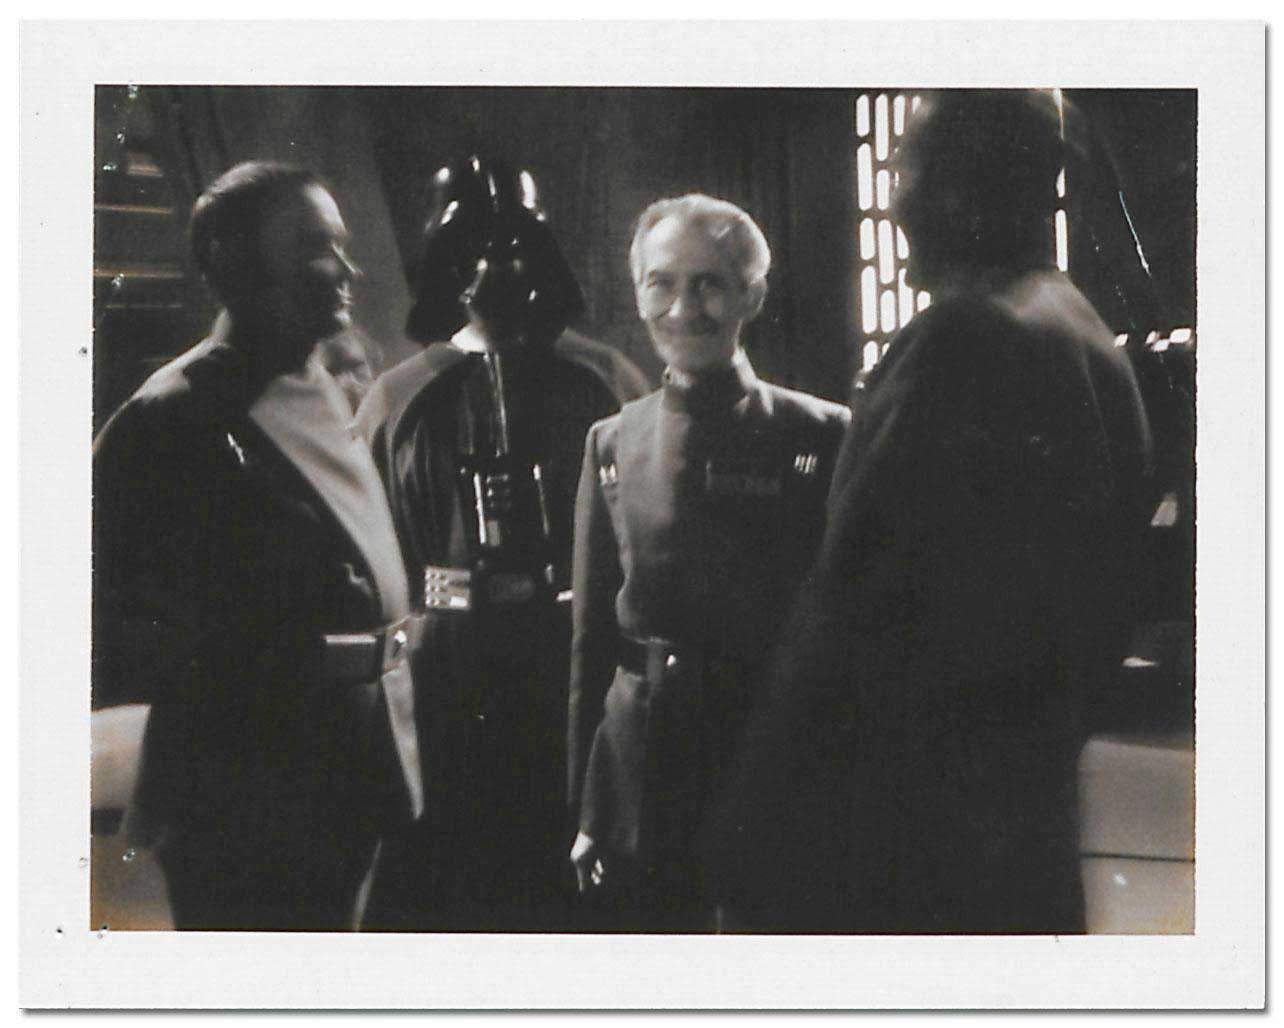 Star Wars: Behind The Scenes Part 2!